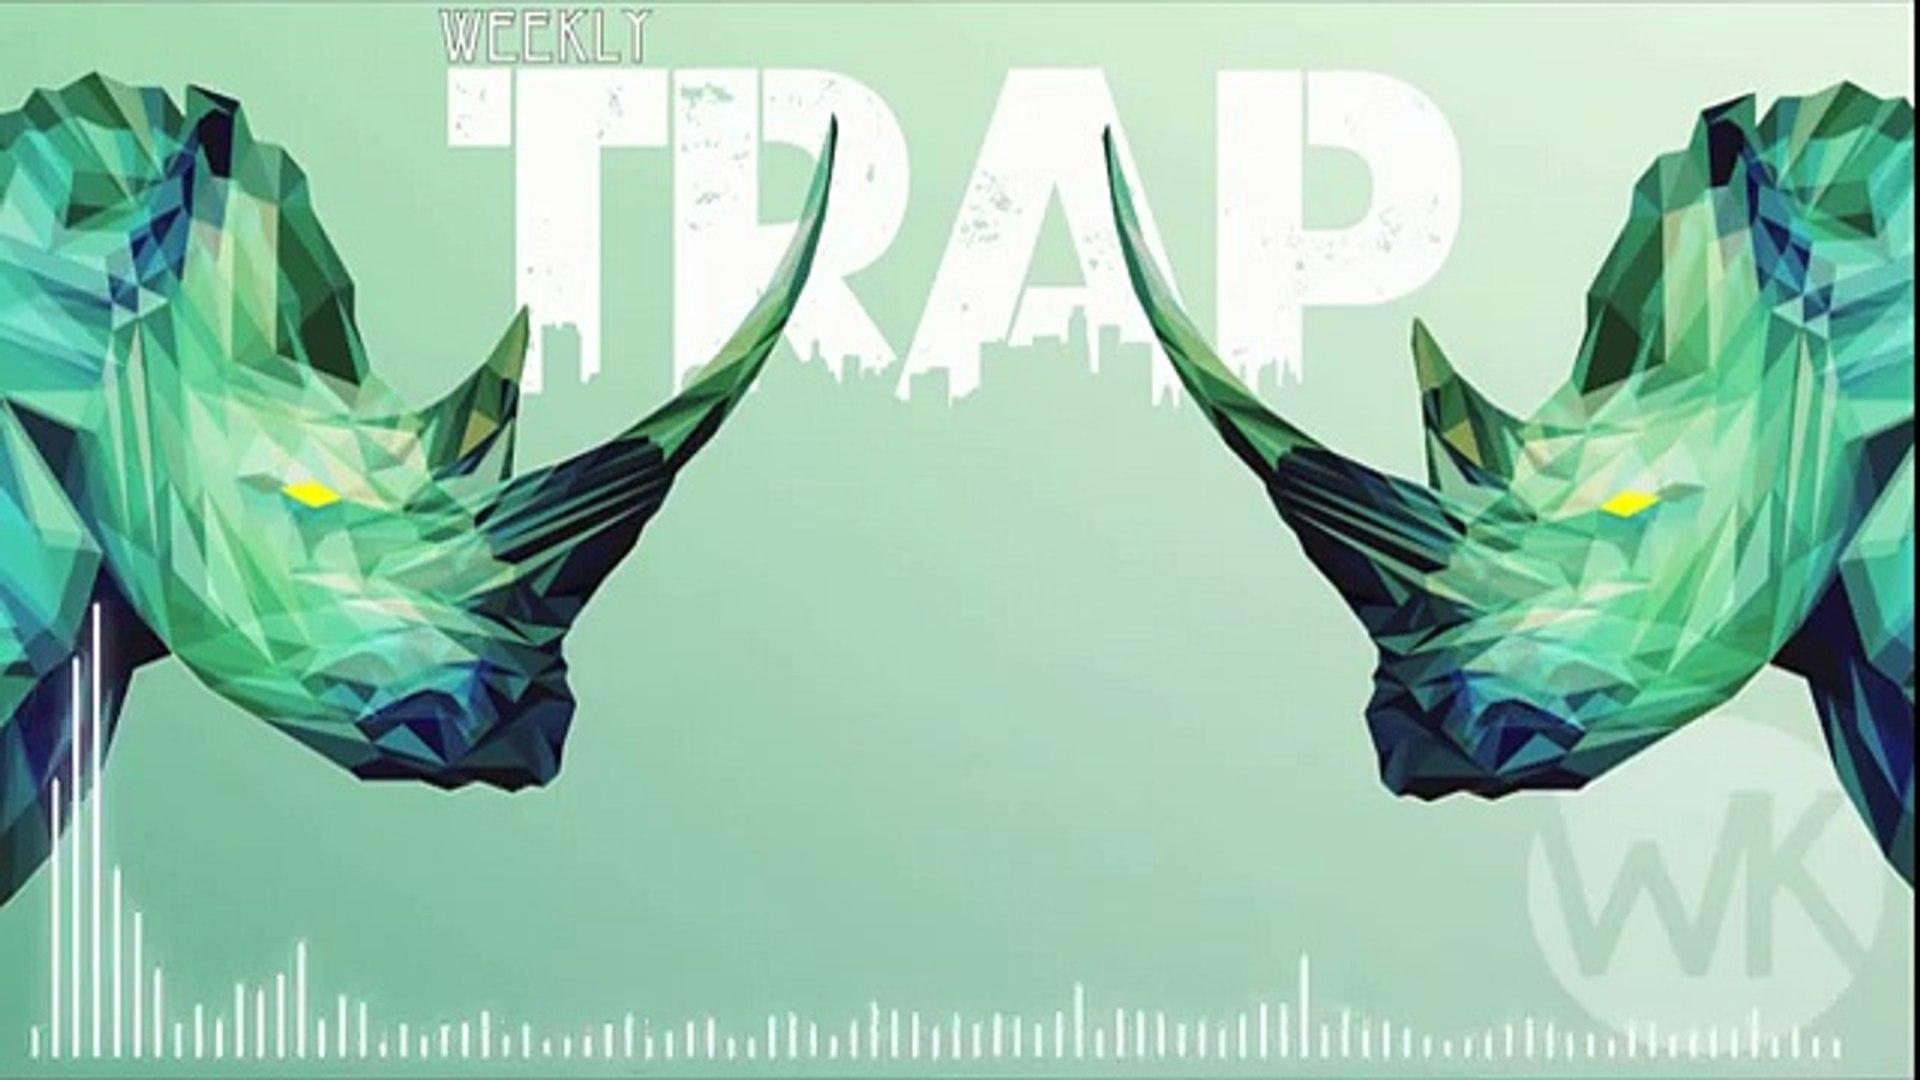 Hip Hop Workout Music Mix 2015 - New Rap Hip Hop Club Remix Electro